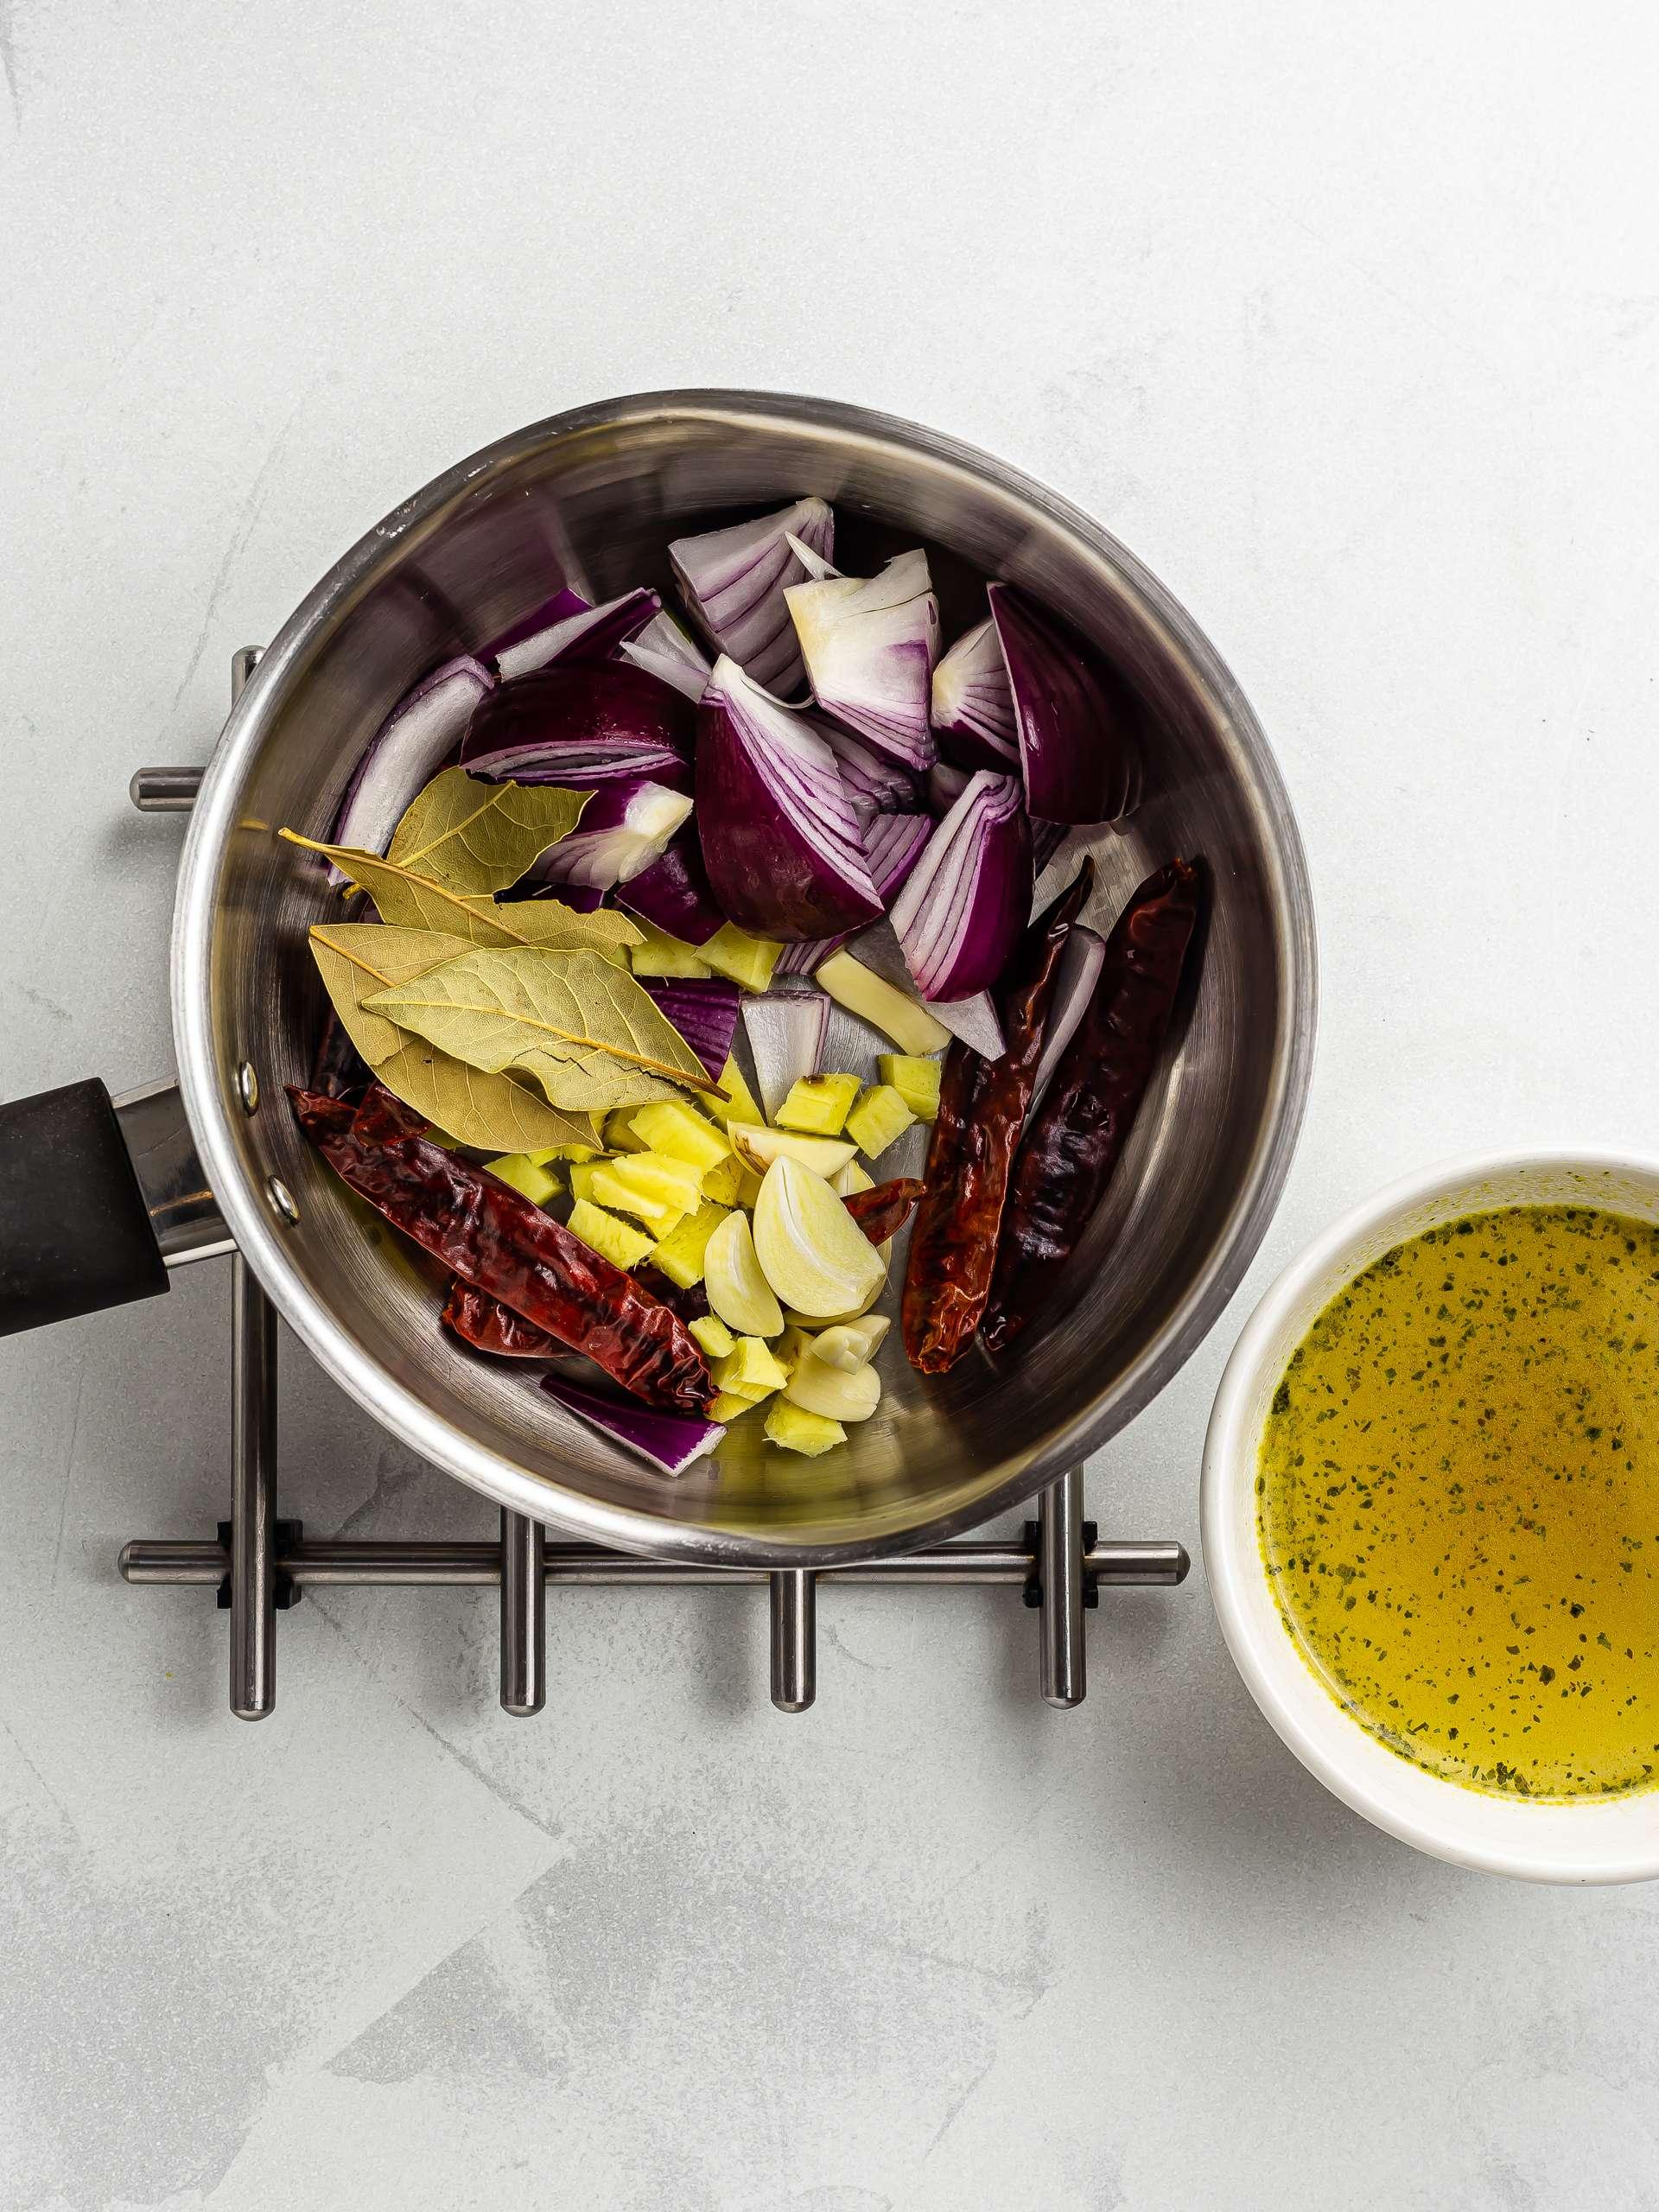 vegan adobo broth ingredients in a pot